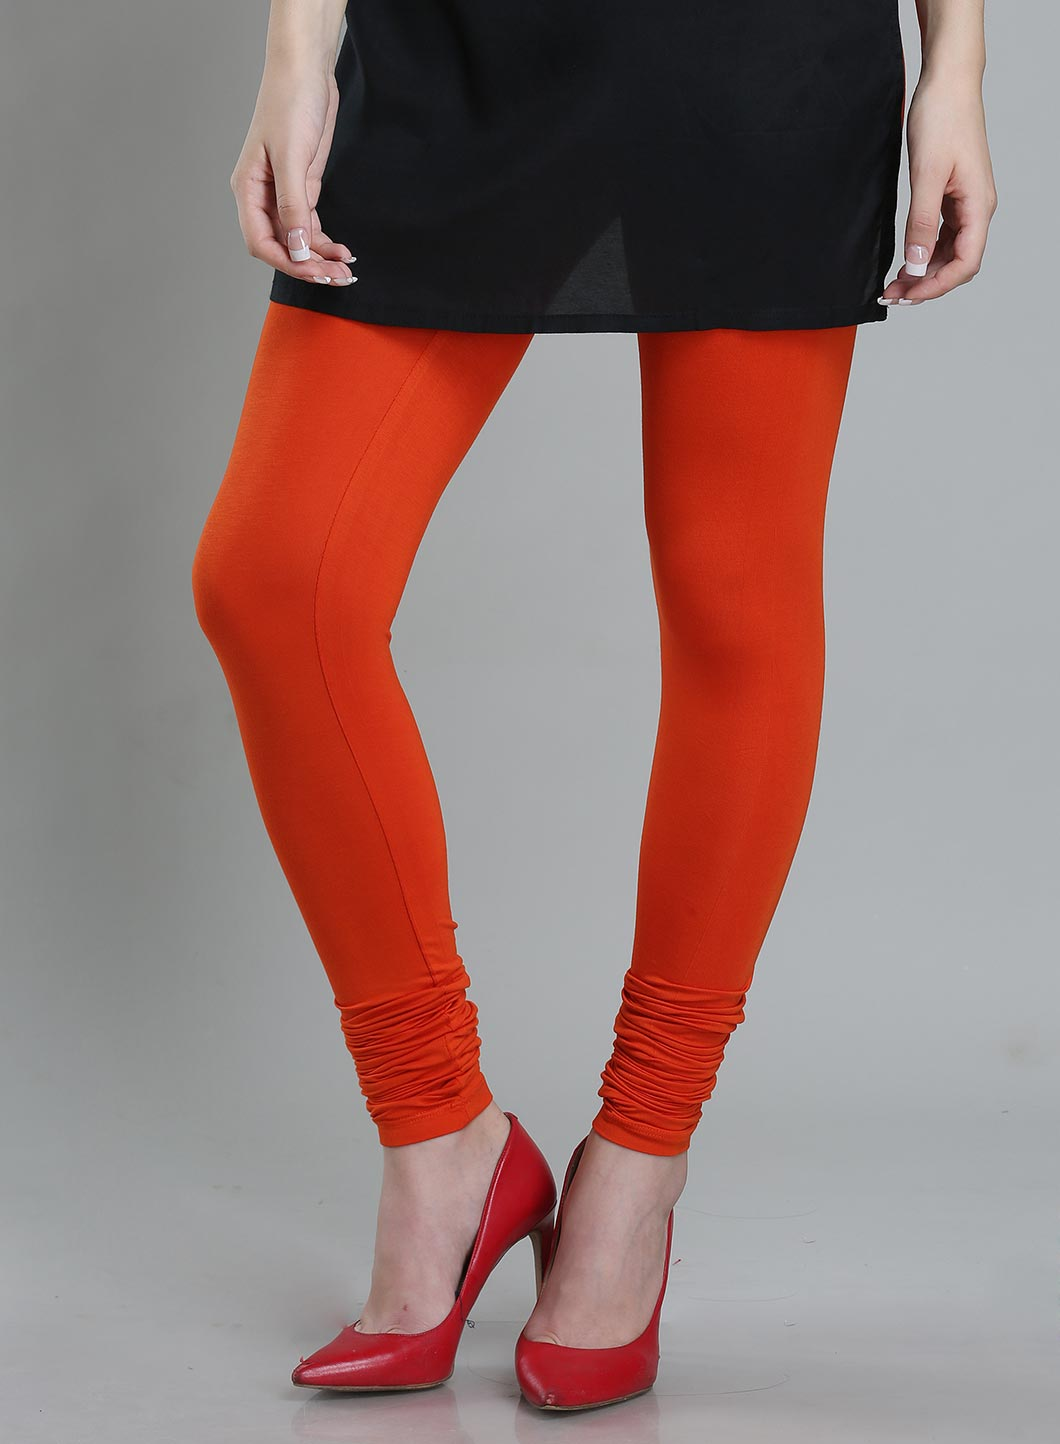 W | Wishful by W-Women Orange Color Churidar